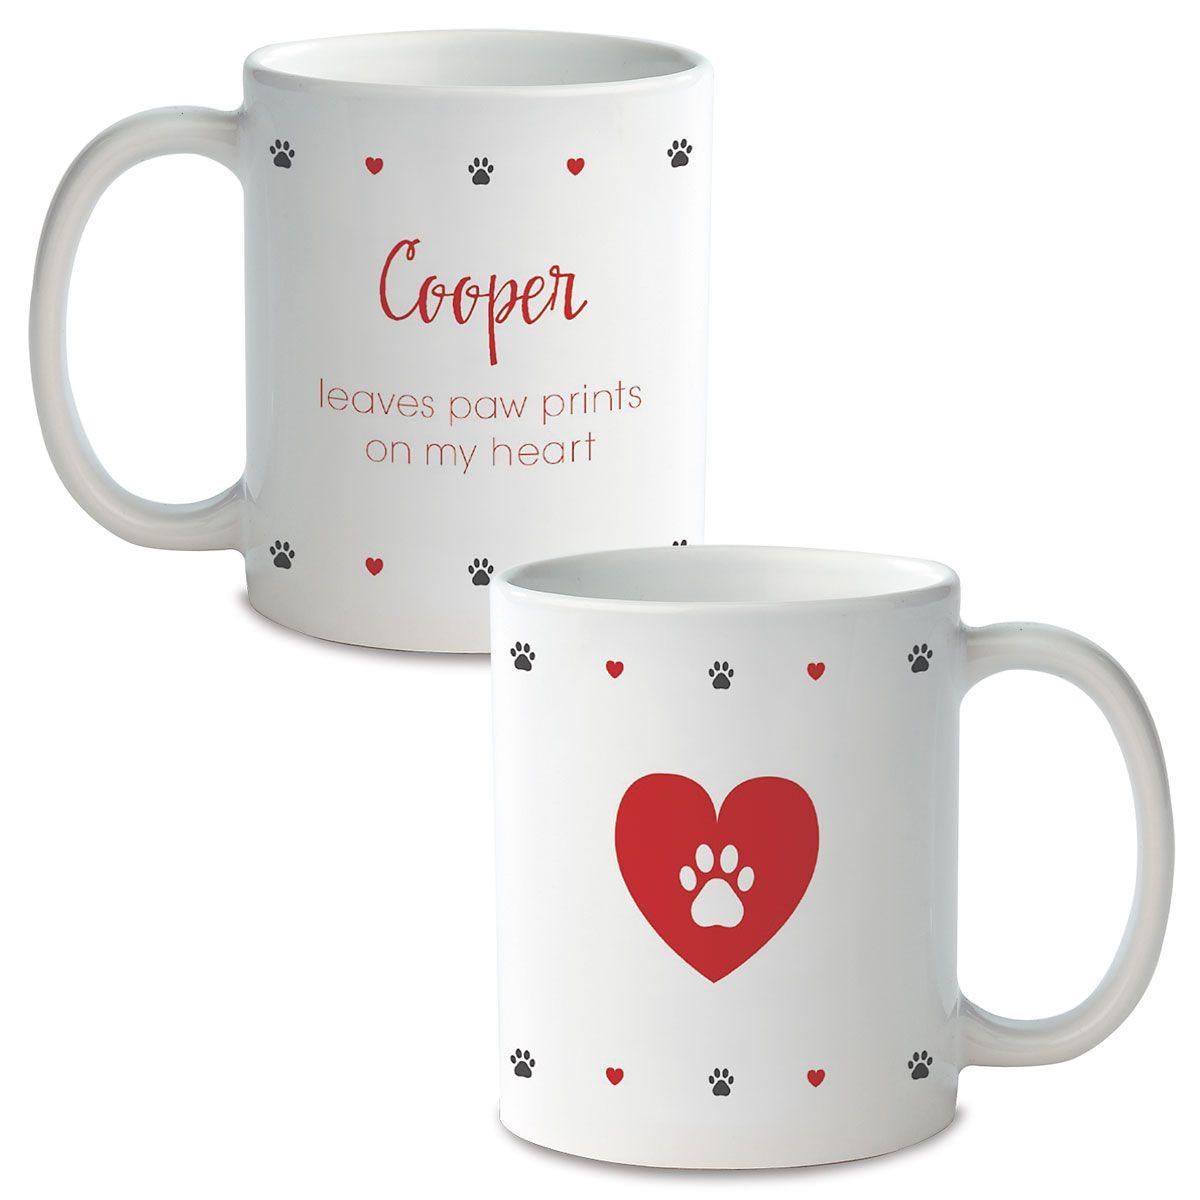 Paw Print Personalized Ceramic Mug